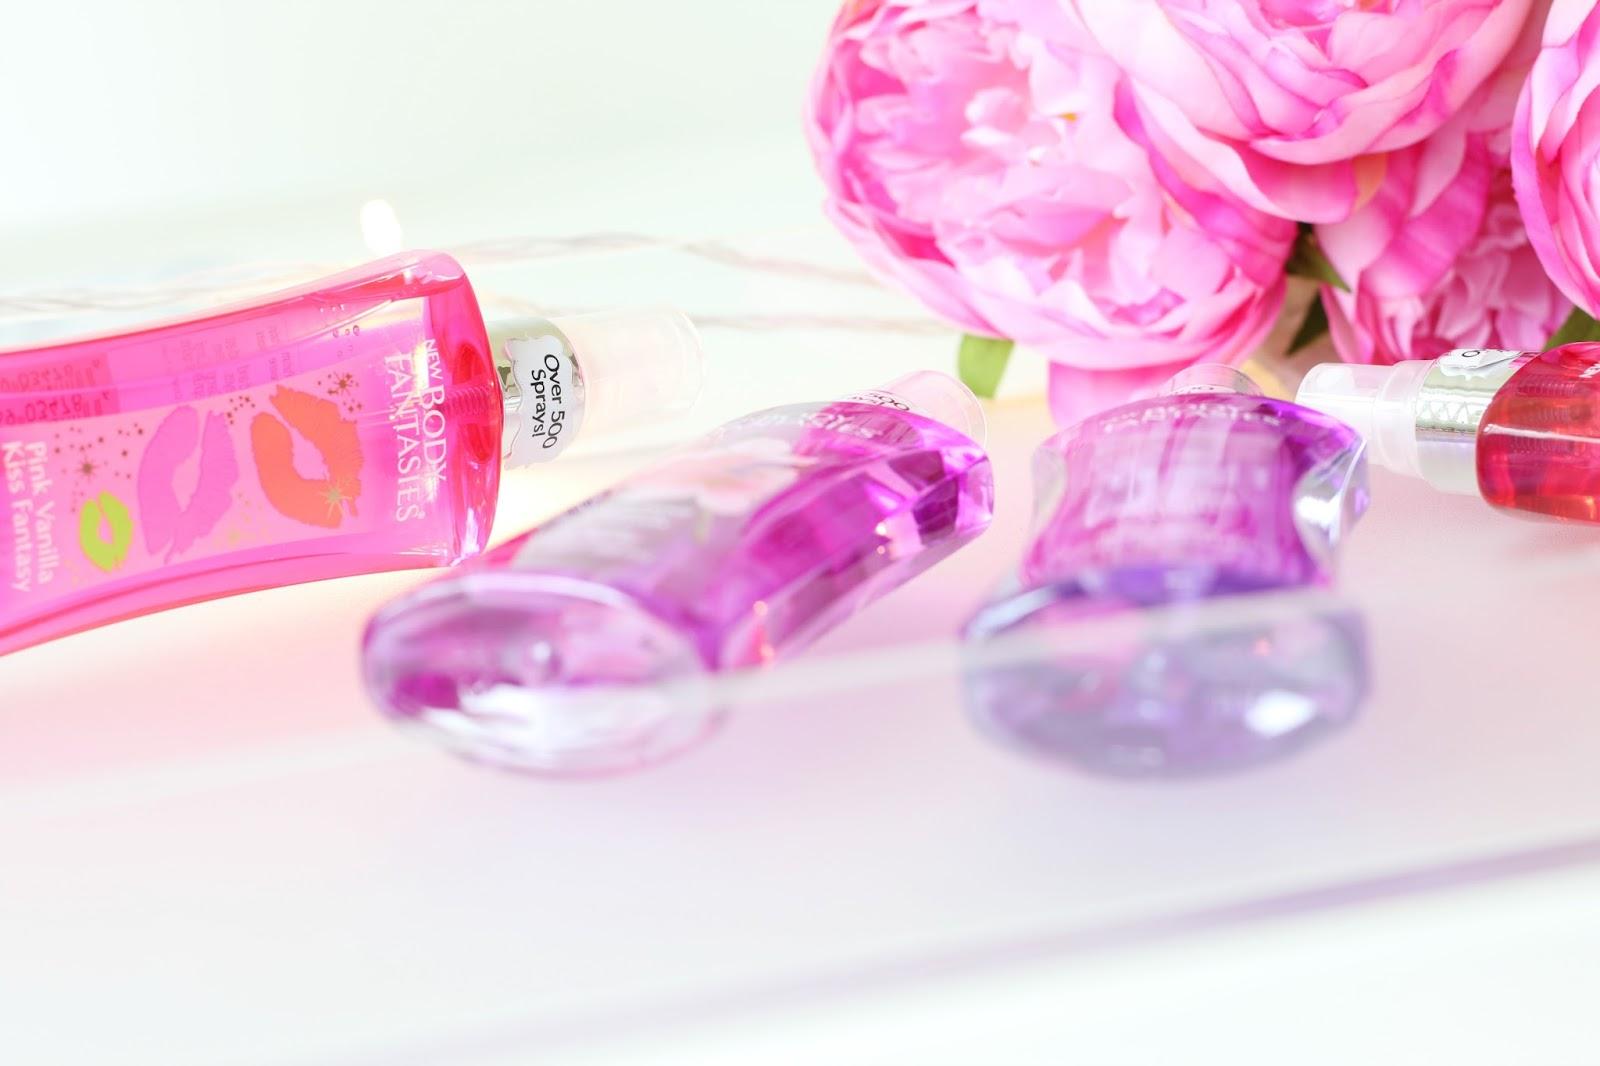 Beauty, Body Fantasies, Body Fantasies UK Launch, Make Up, Drugstore Beauty, Superdrug, Body Fantasies flavour, Body Fantasies Japanese Cherry Blossom, Body Fantasies  Pink Grapefruit Fantasy, Body Fantasies Twilight Mist, Body Fantasies Pink Vanilla Kiss Fantasy